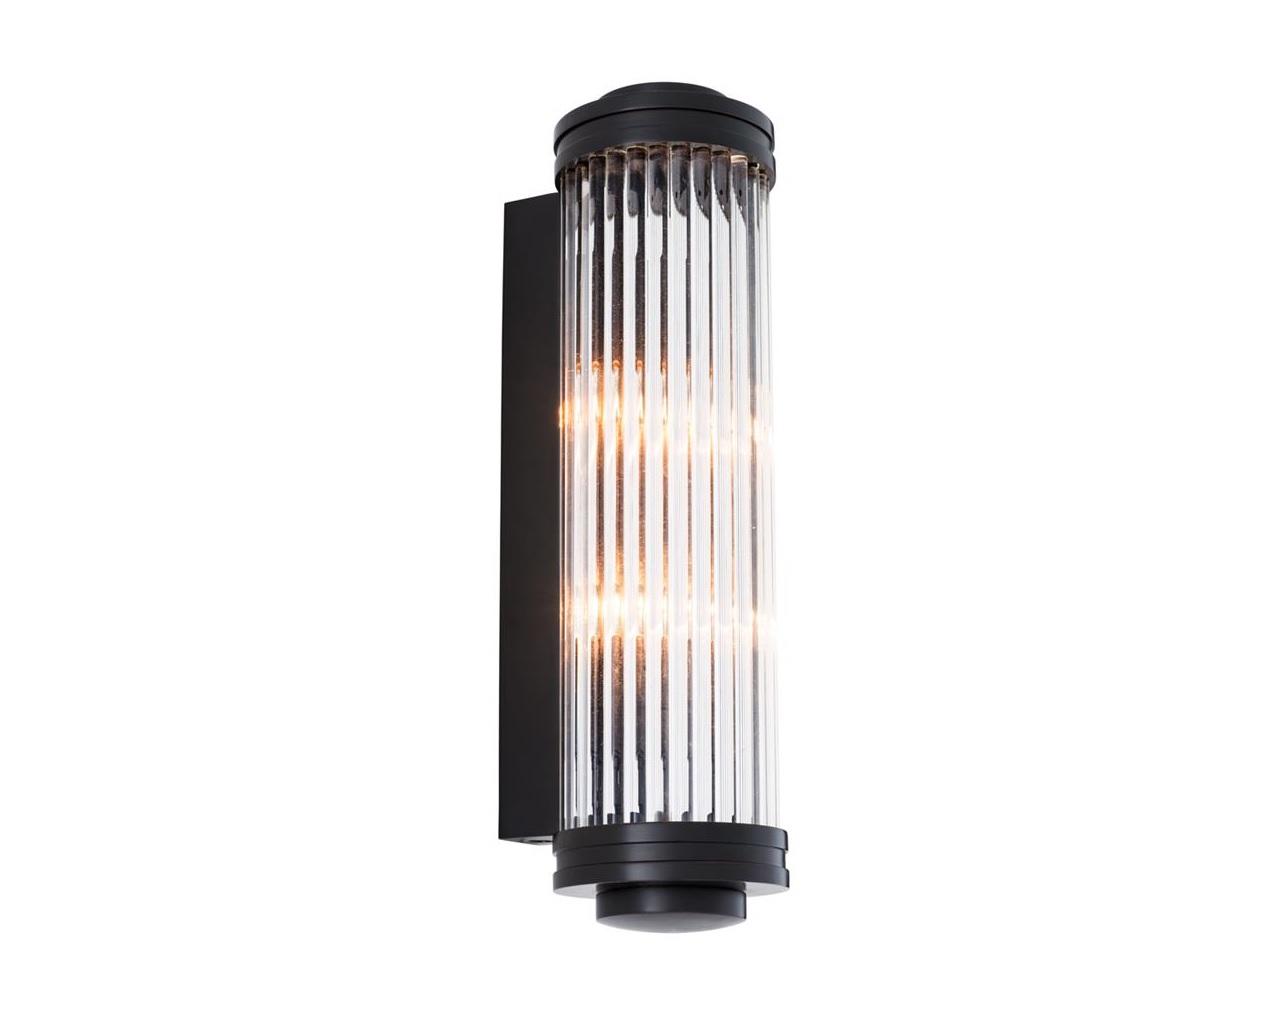 Настенный светильник Wall Lamp Gascogne LБра<br>&amp;lt;div&amp;gt;Вид цоколя: E14&amp;lt;br&amp;gt;&amp;lt;/div&amp;gt;&amp;lt;div&amp;gt;&amp;lt;div&amp;gt;Мощность: 40W&amp;lt;/div&amp;gt;&amp;lt;div&amp;gt;Количество ламп: 2 (нет в комплекте)&amp;lt;/div&amp;gt;&amp;lt;/div&amp;gt;<br><br>Material: Металл<br>Width см: 11<br>Depth см: 14<br>Height см: 40